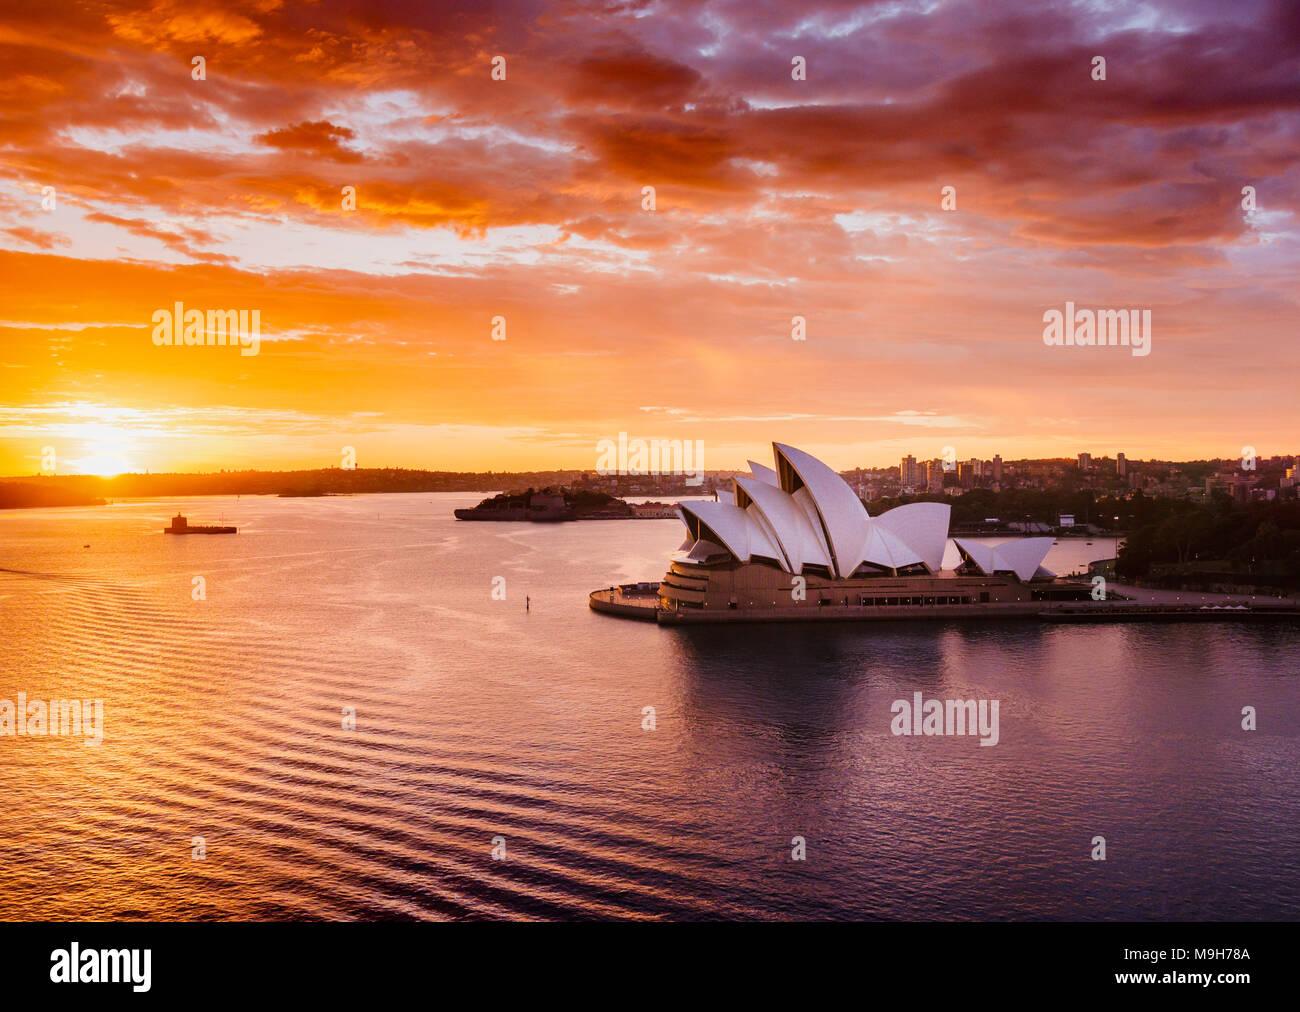 Splendid sunrise at the Sydney Harbour, NSW, Australia Stock Photo